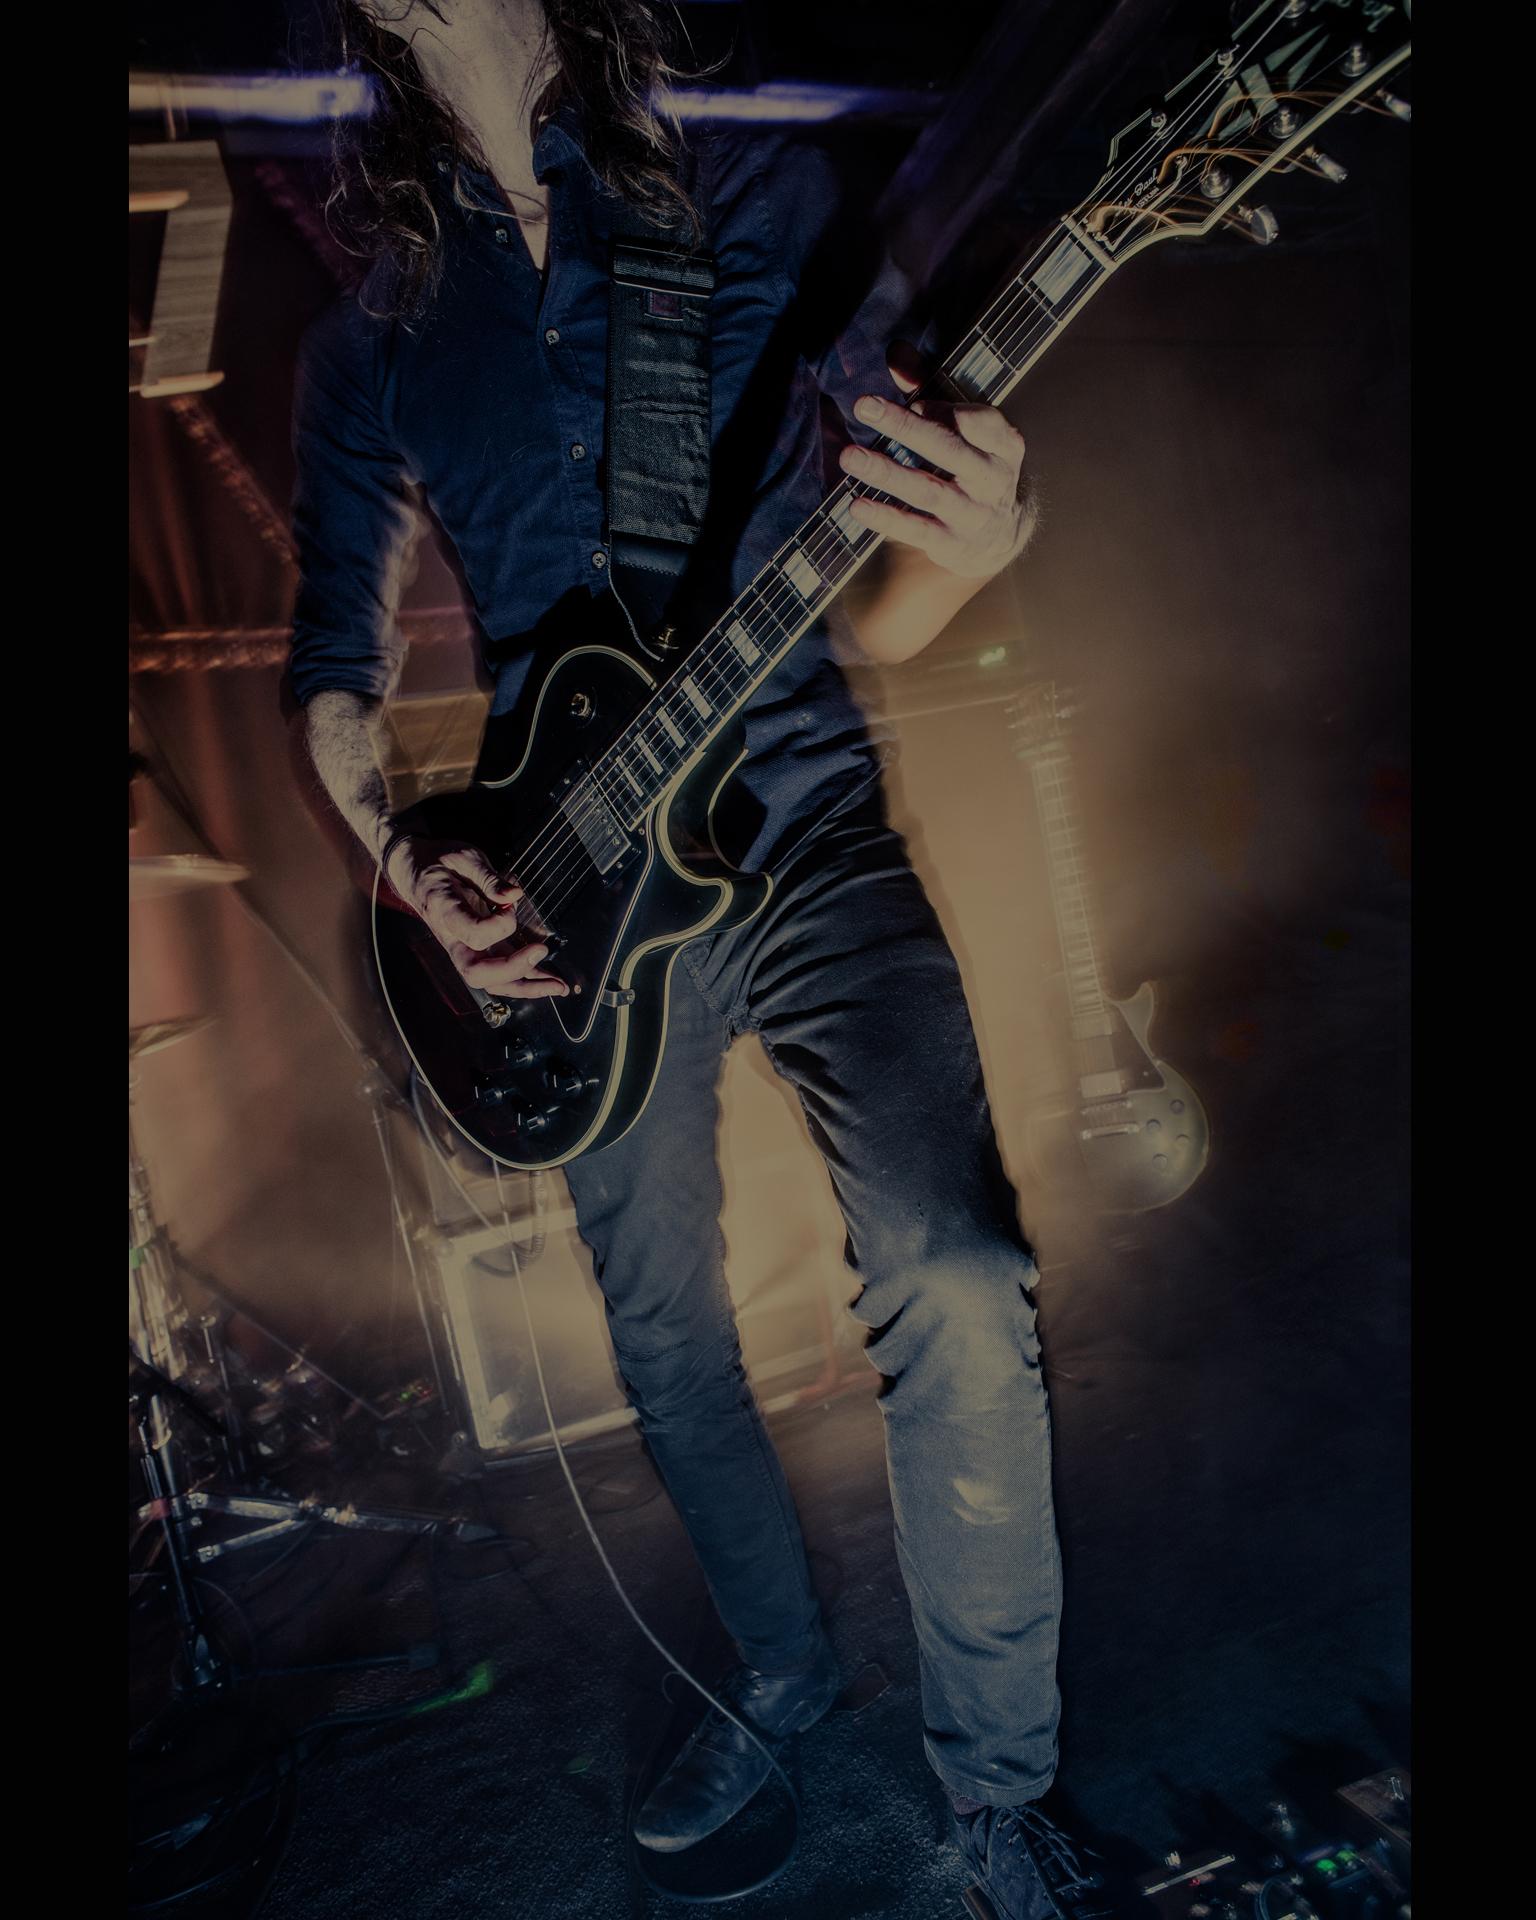 Guitarist Mike Sullivan